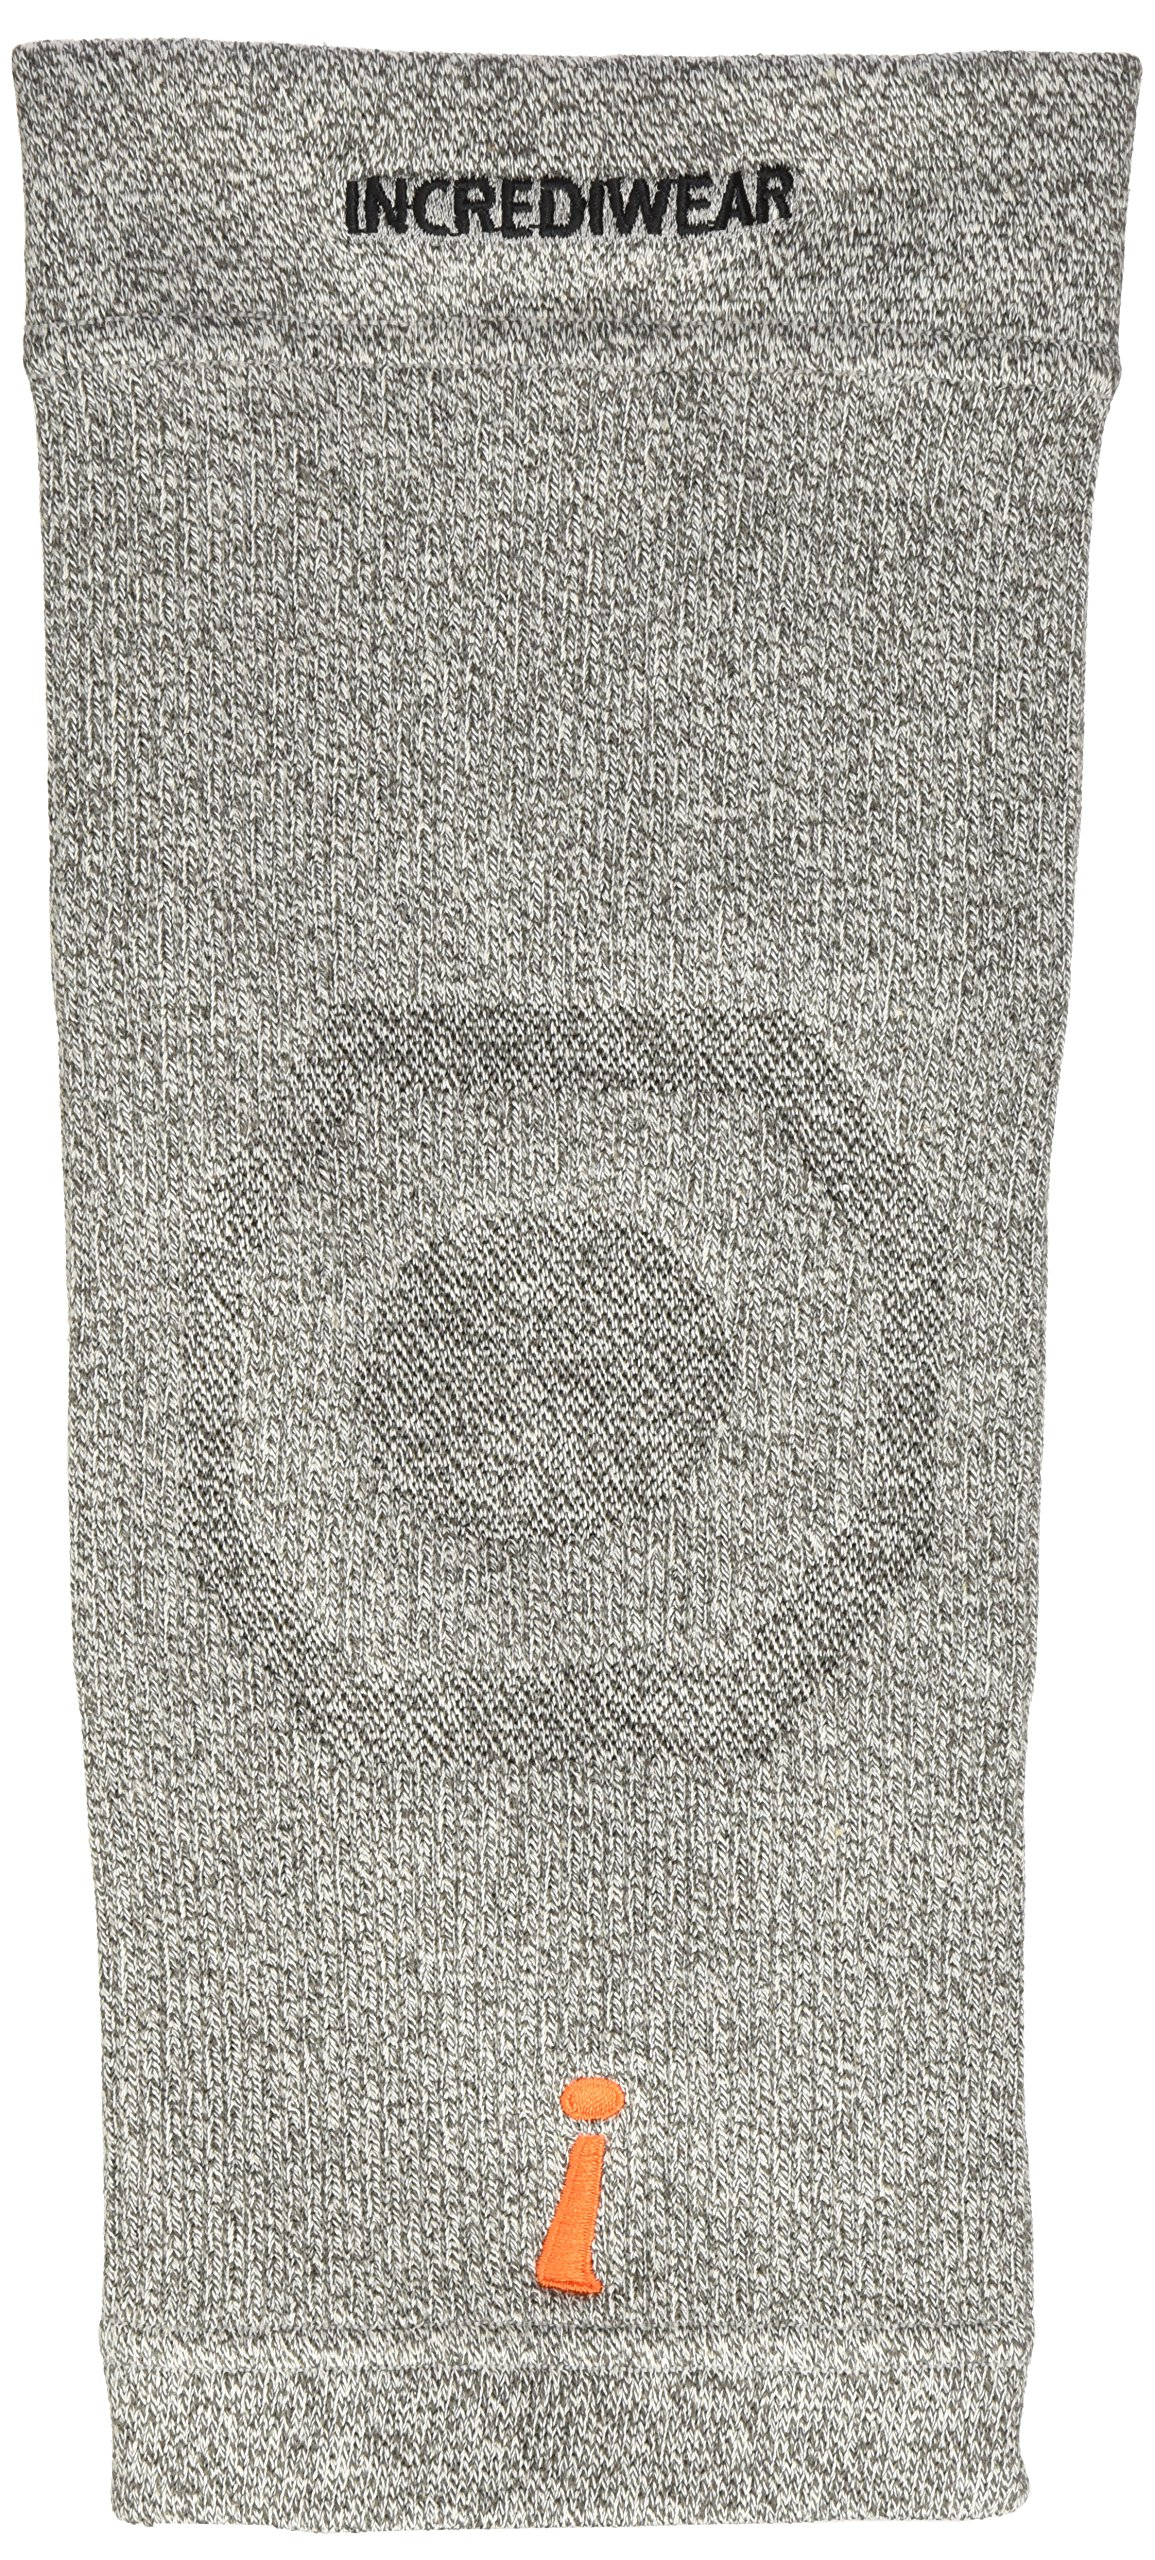 Incrediwear Incredibrace - Knee Support Brace Large 14-16 Inches, Gray by Incrediwear